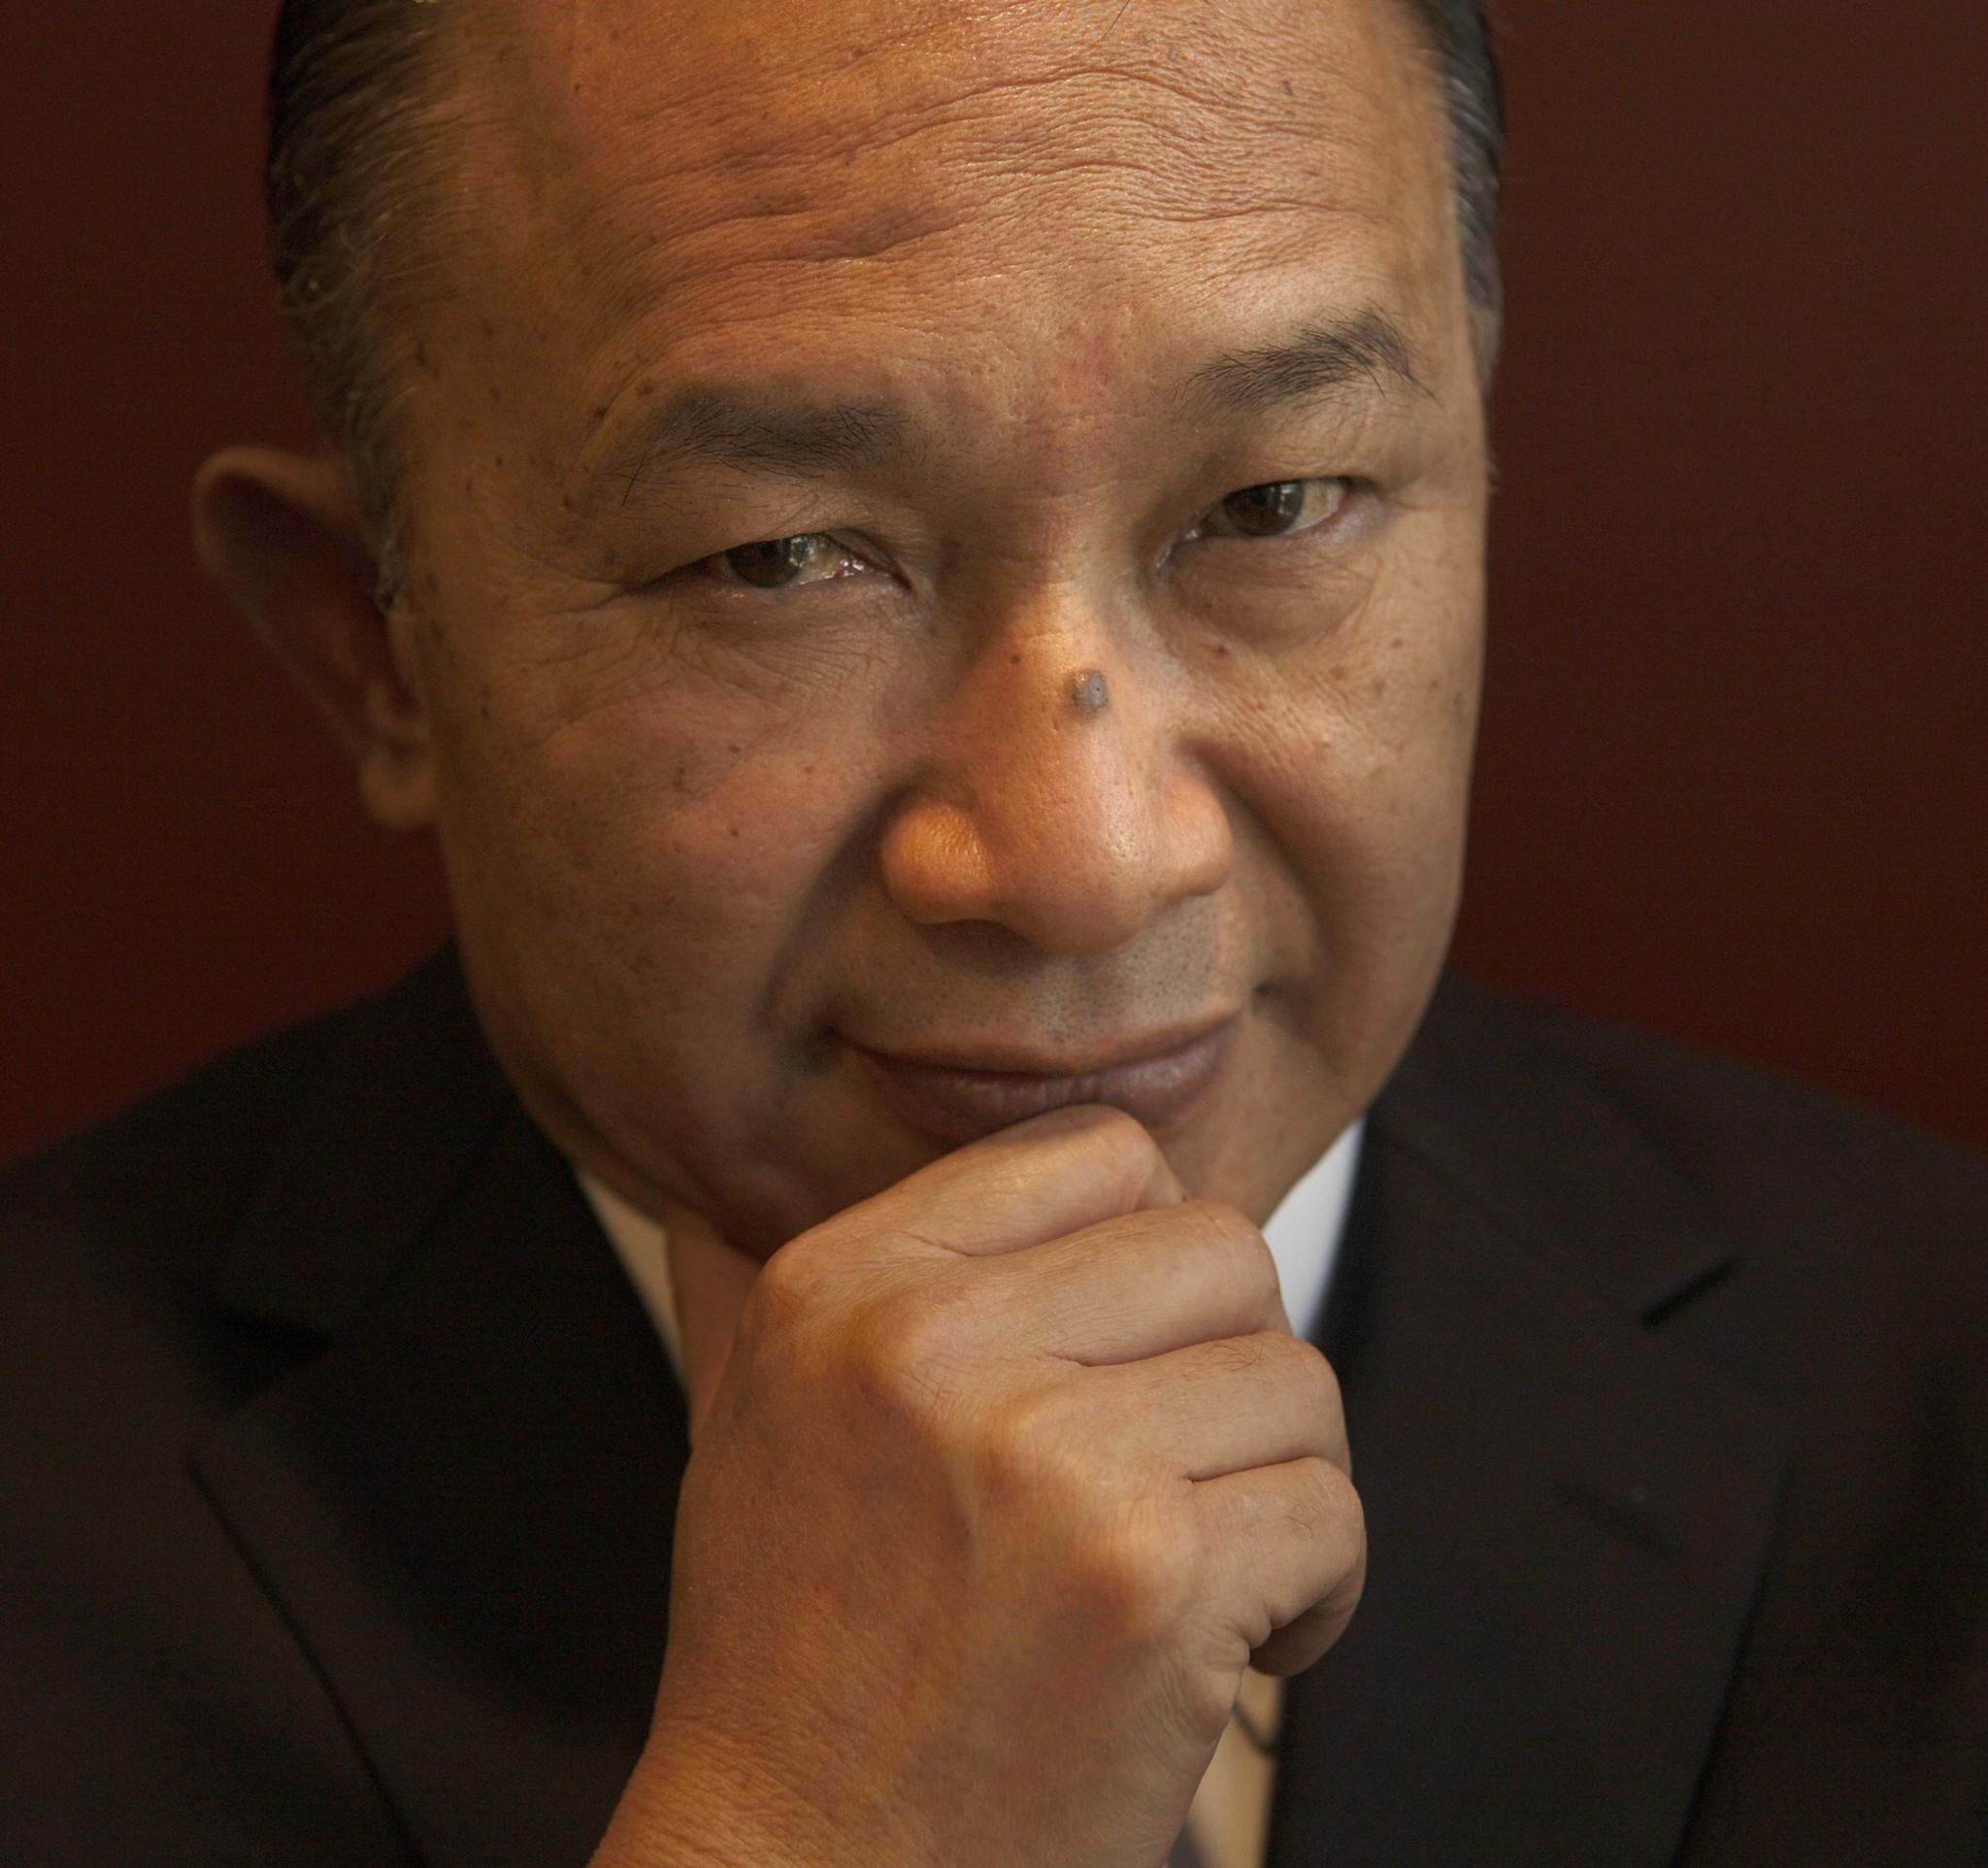 John Woo will helm the jury at the Beijing International Film Festival.